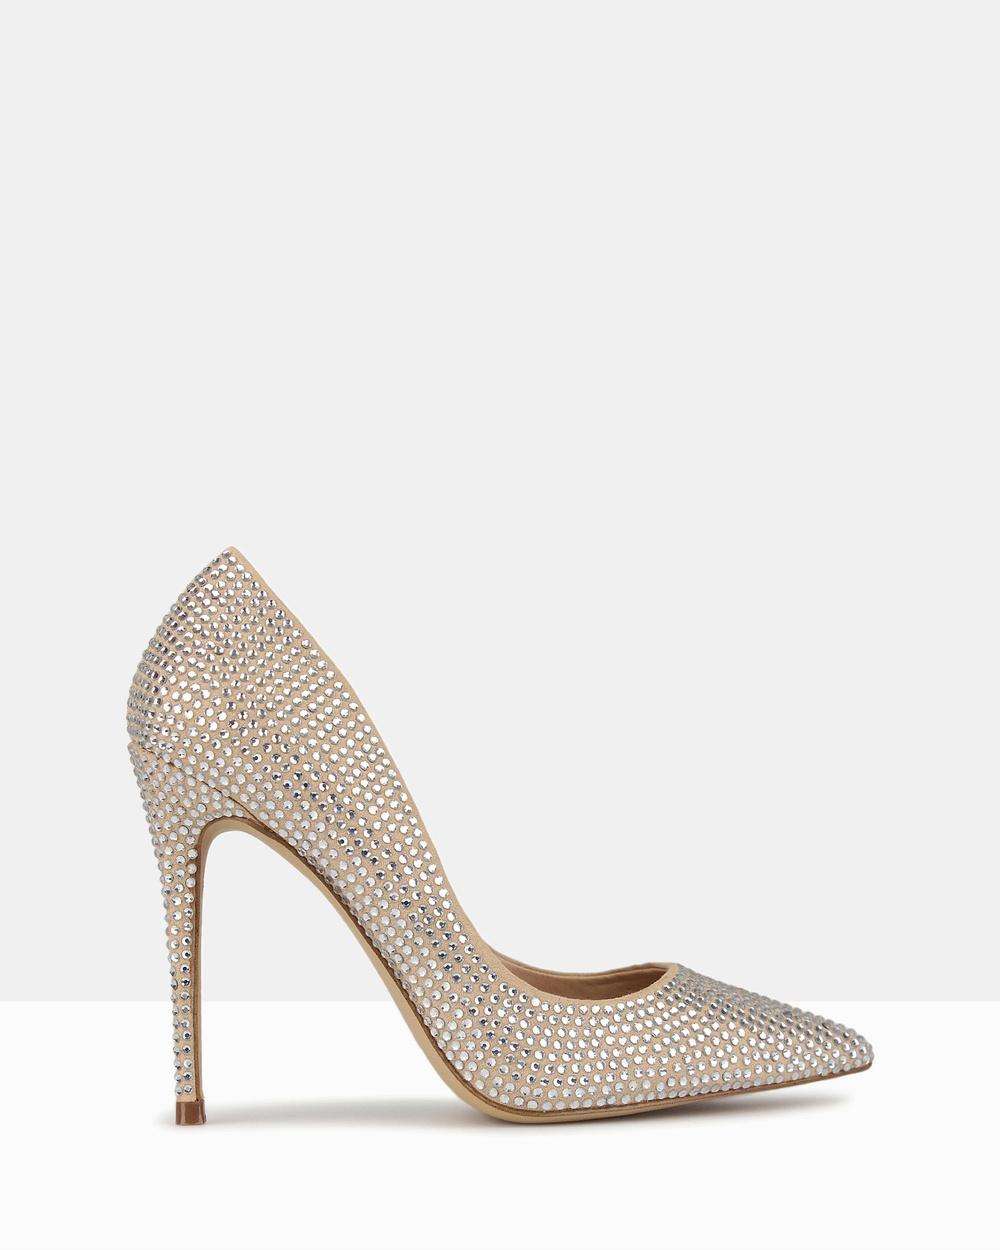 Betts Blossom 2 Diamante Stiletto Heels Heels Silver Diamante Blossom 2 Diamante Stiletto Heels